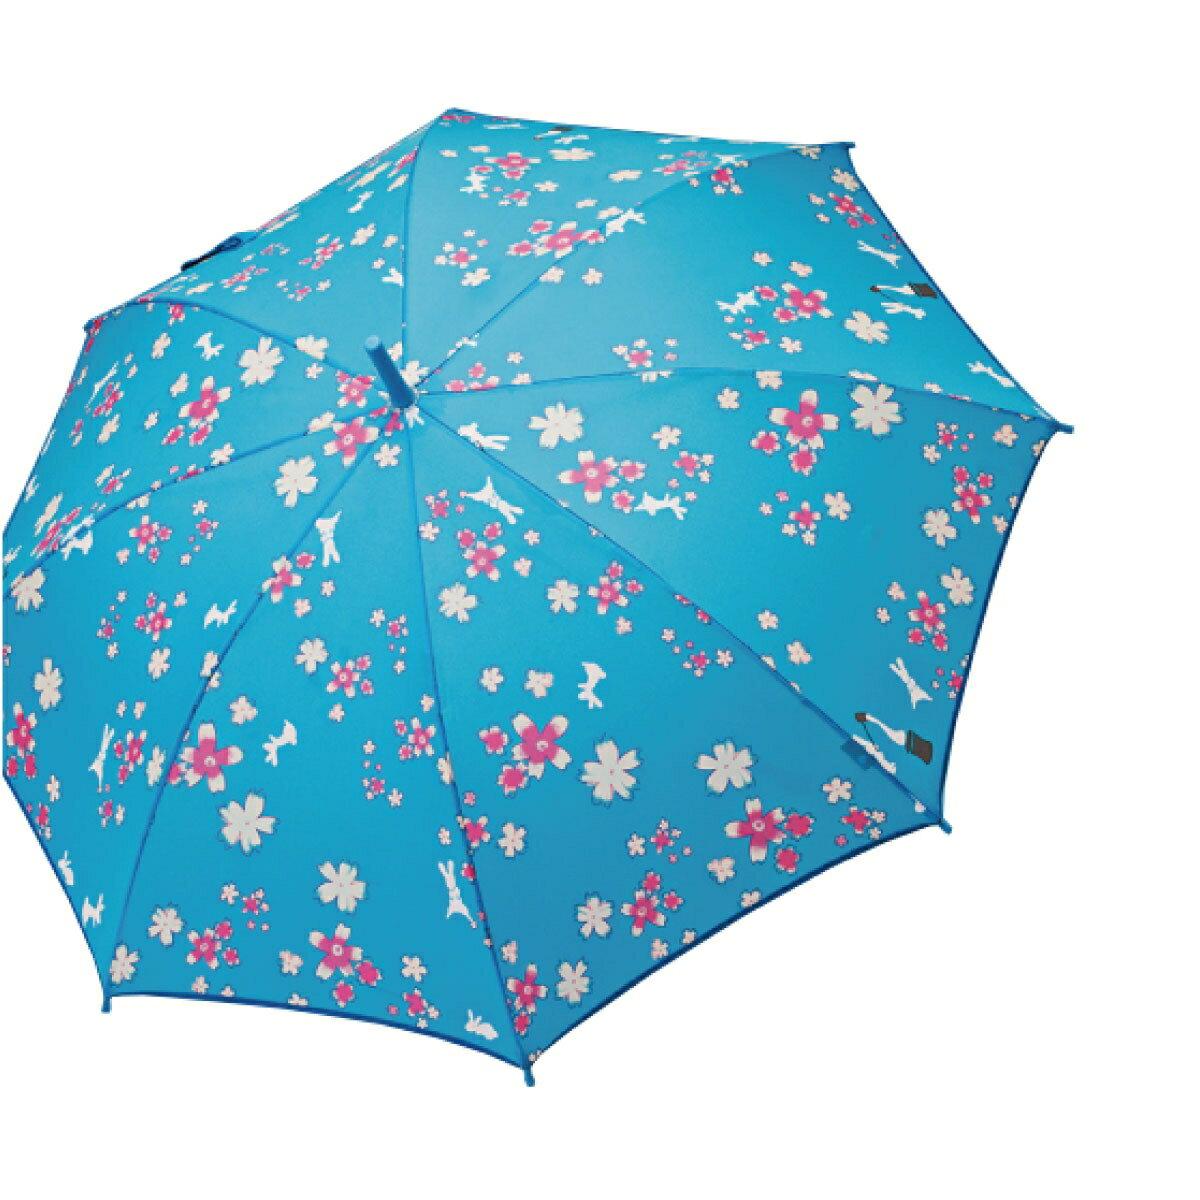 【iumbrella】兒童傘-櫻花玉兔